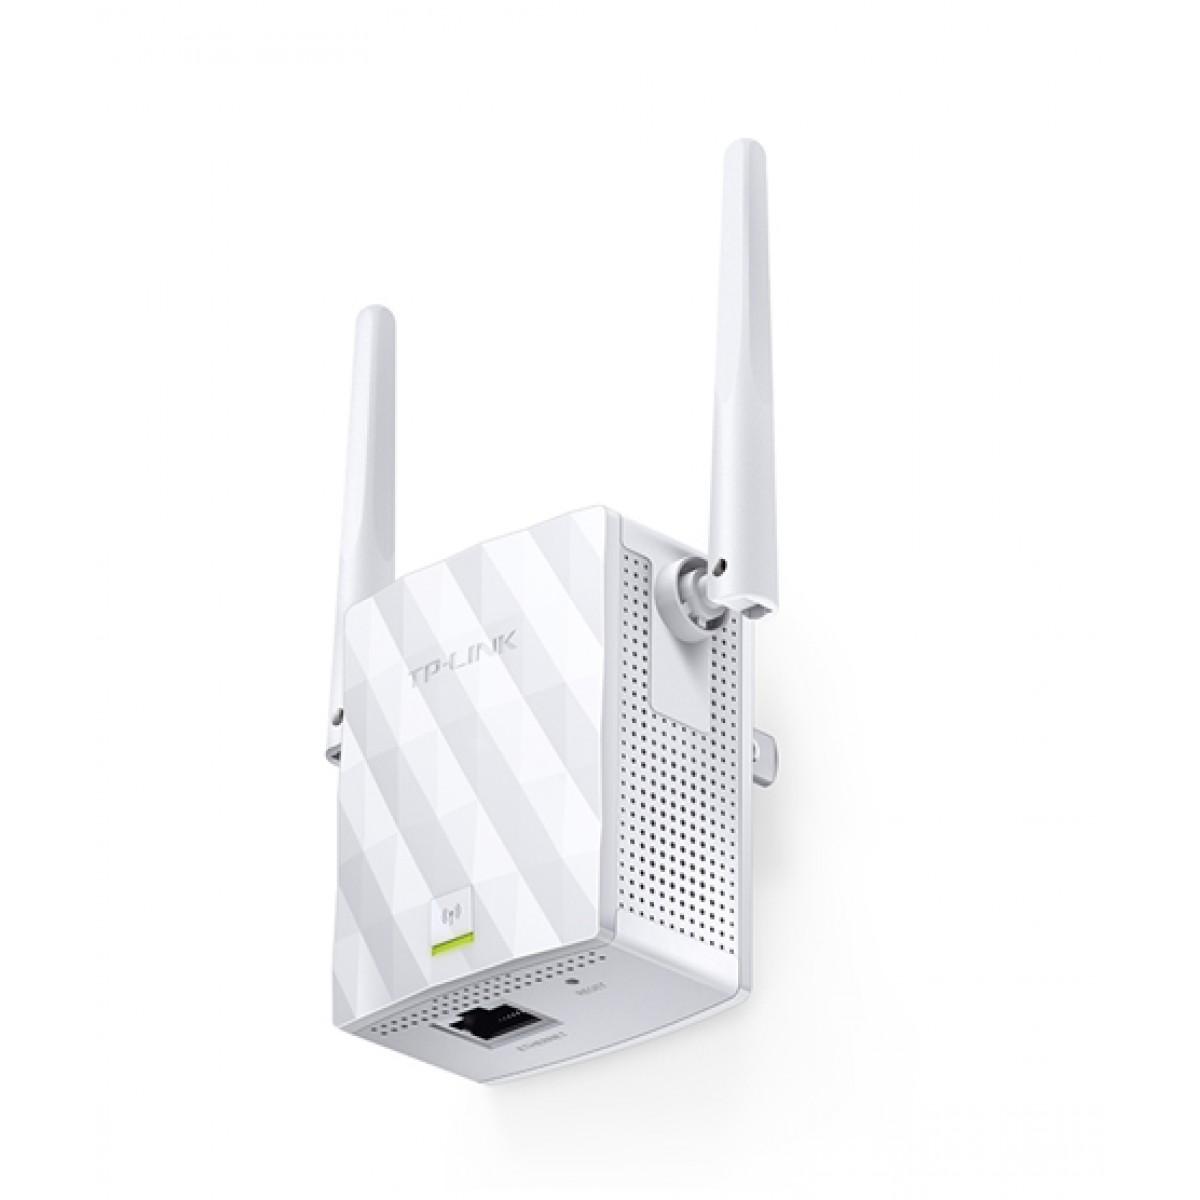 TP-Link 300Mbps Wi-Fi Range Extender (TL-WA855RE)